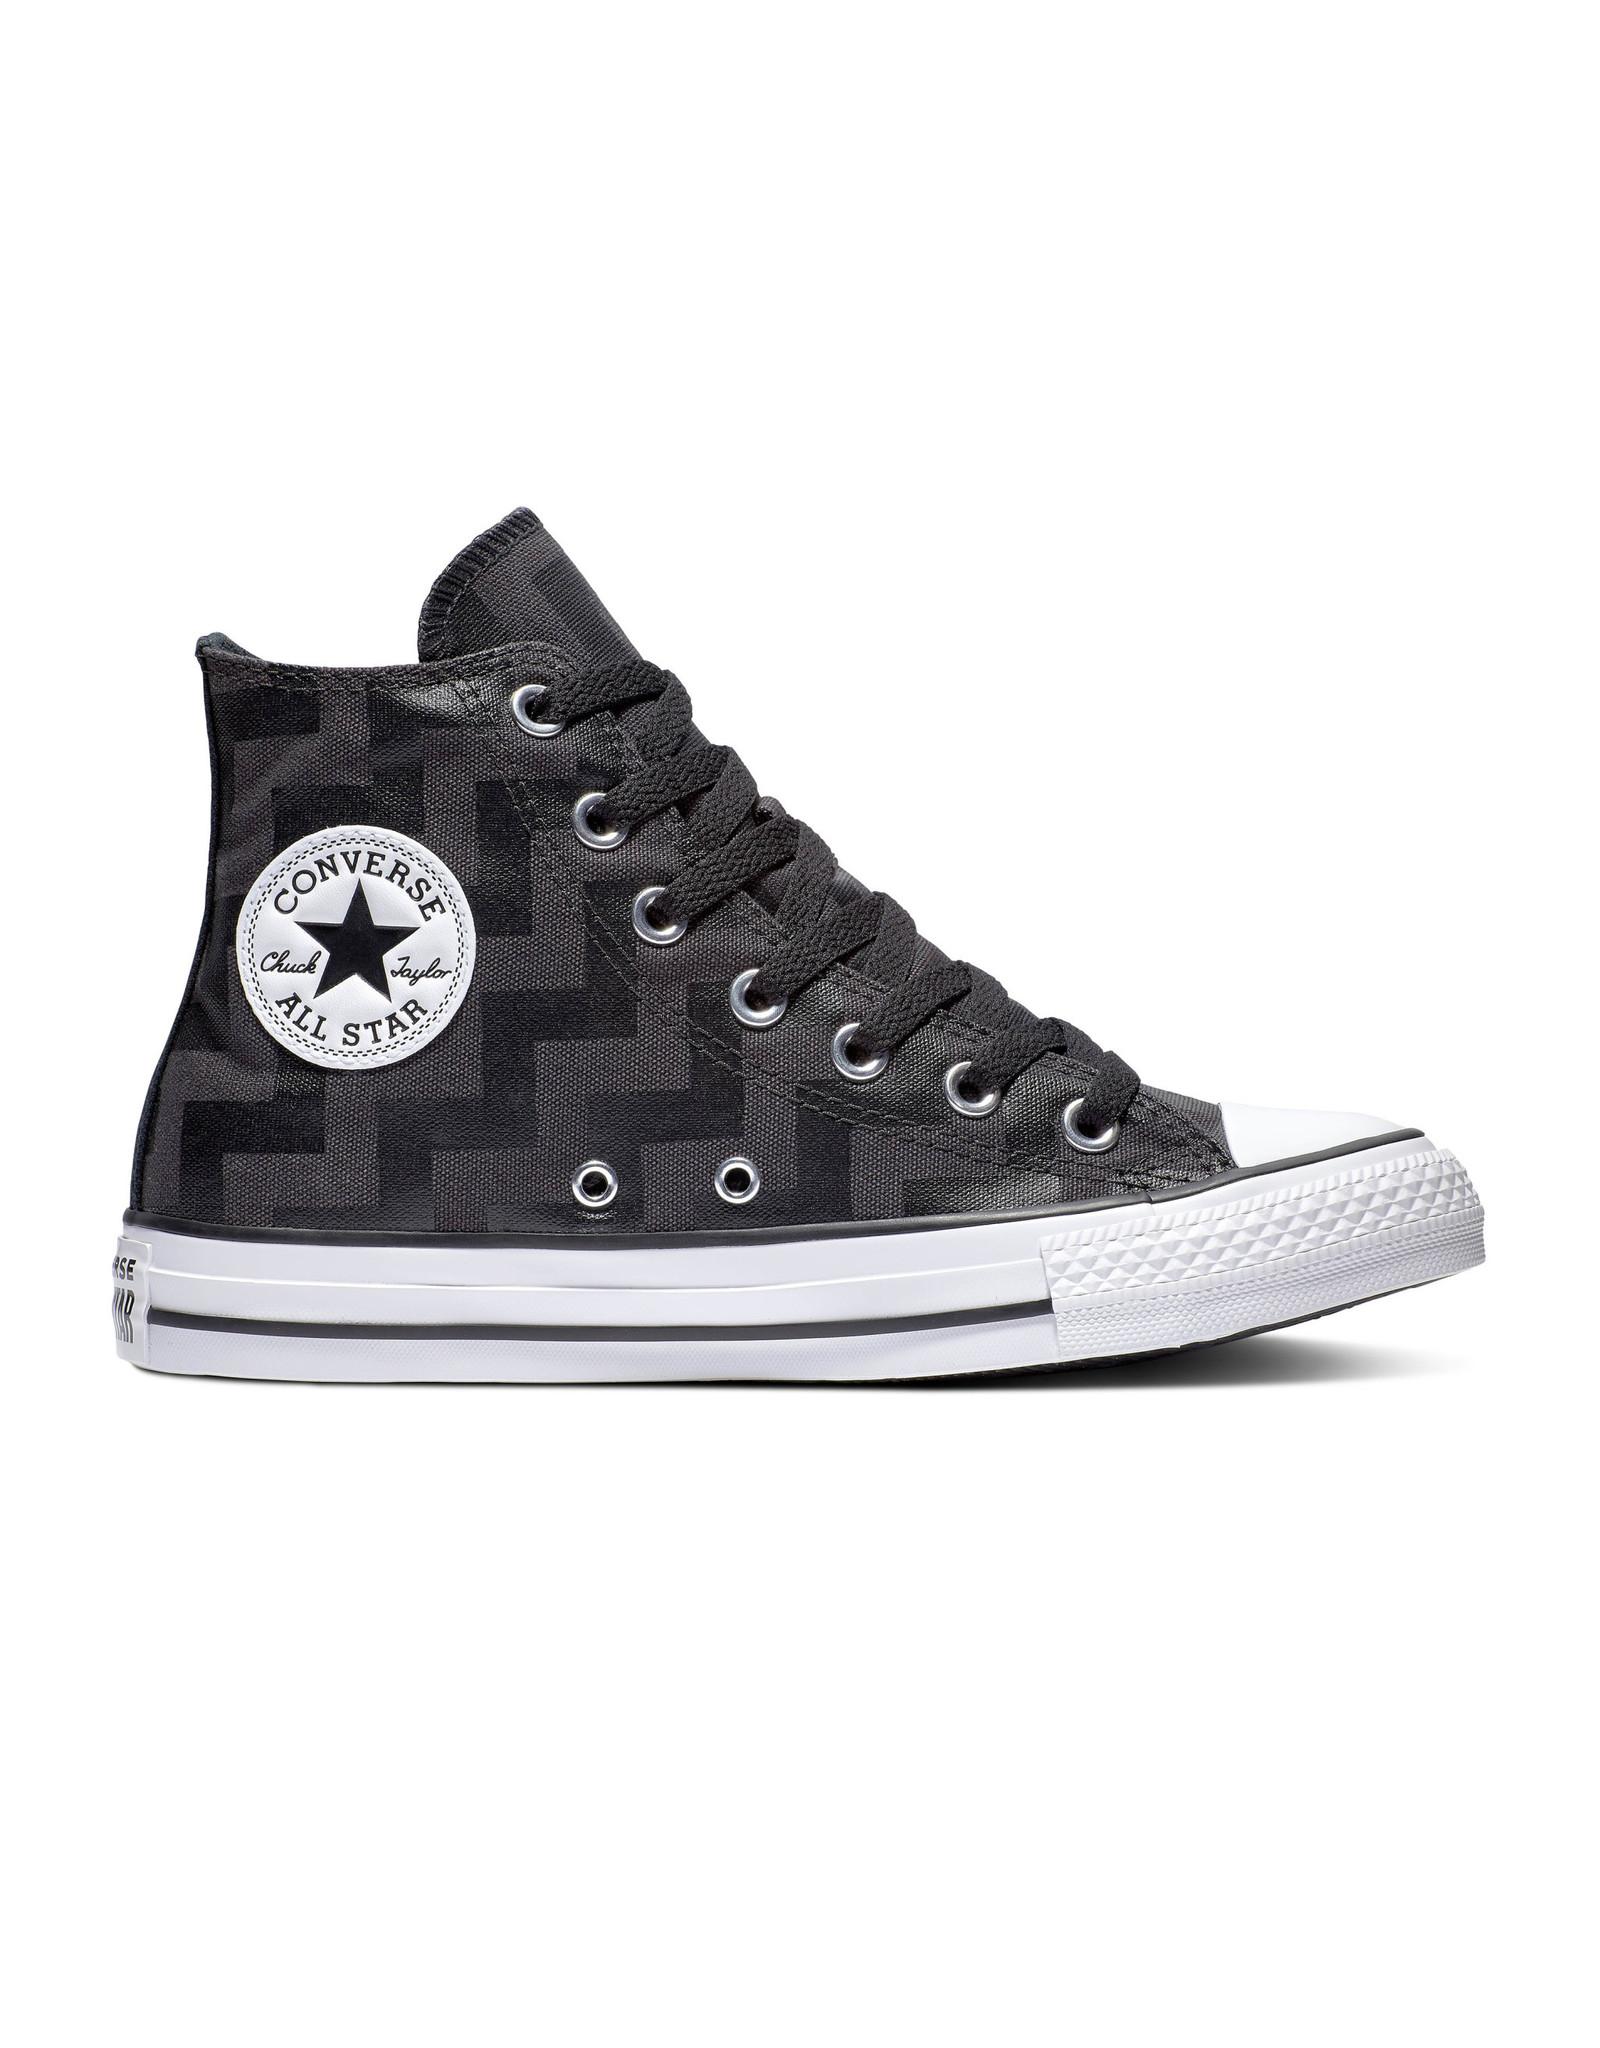 CONVERSE CHUCK TAYLOR ALL STAR HI BLACK/ALMOST BLACK/WHITE C19SAL-565212C